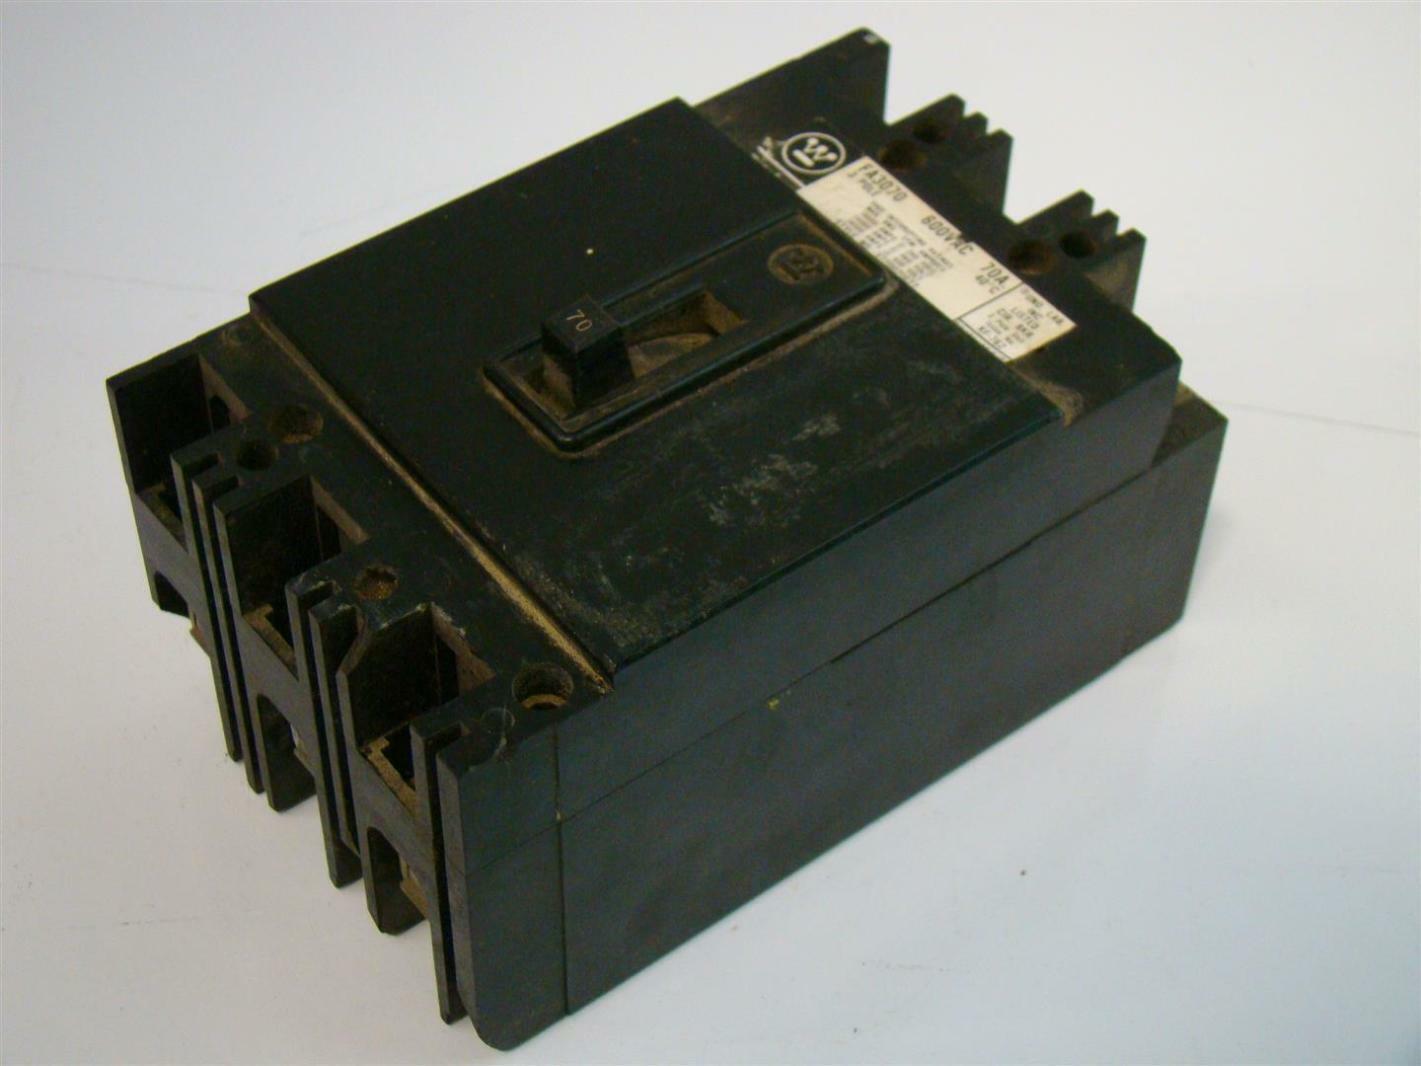 Westinghouse Circuit Breaker 3Pole 600Vac 70A 372D021G22 FA3070